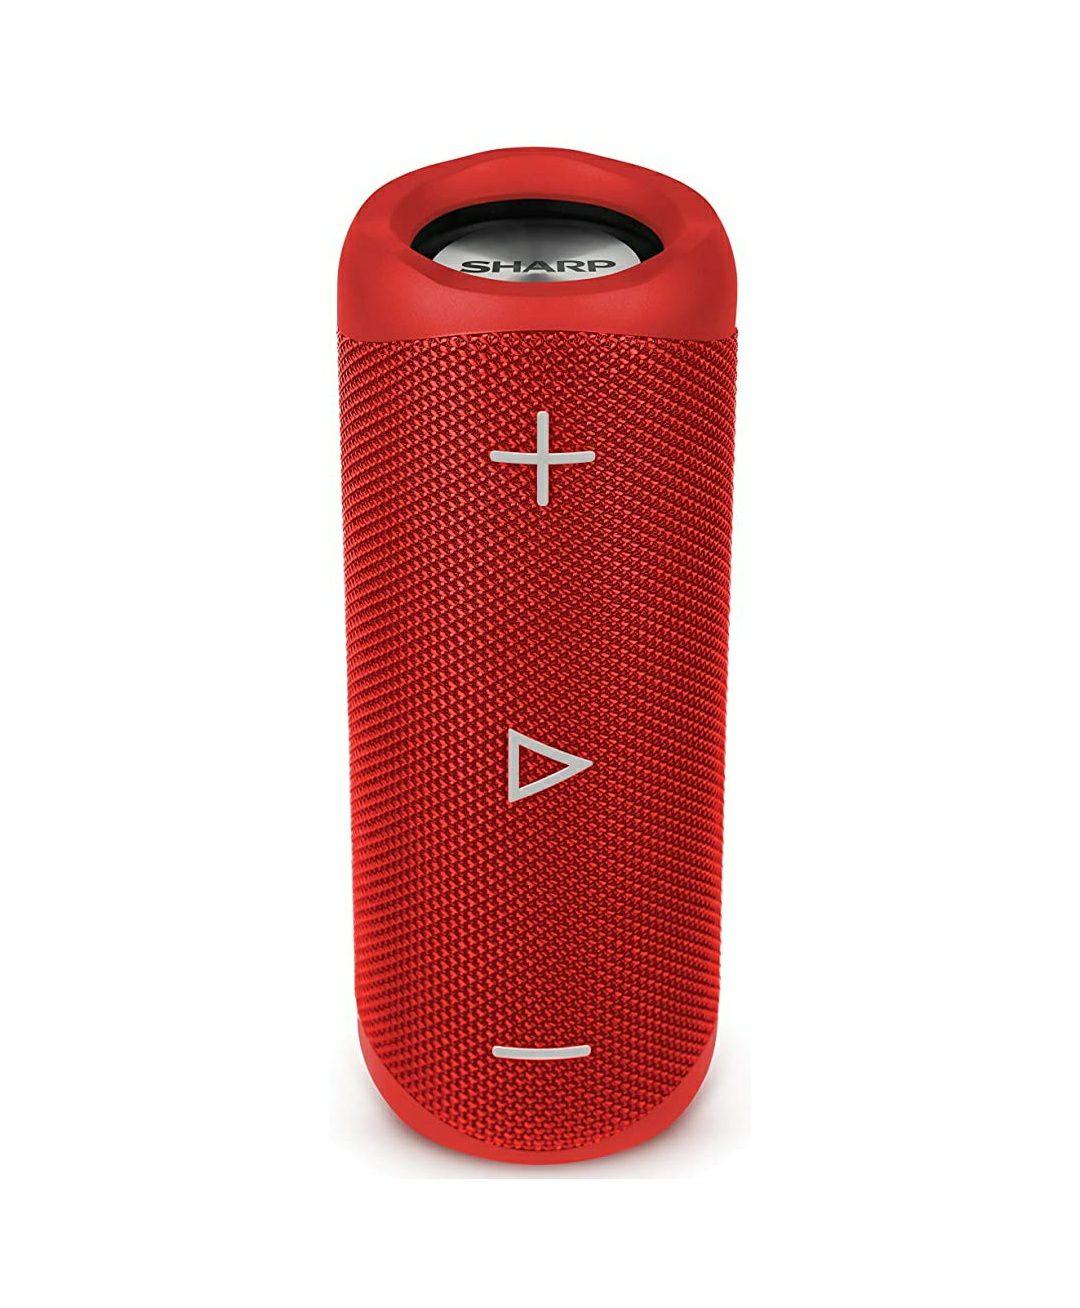 Altavoz Bluetooth Sharp GX-BT280(RD) 20W IP56 por 41€